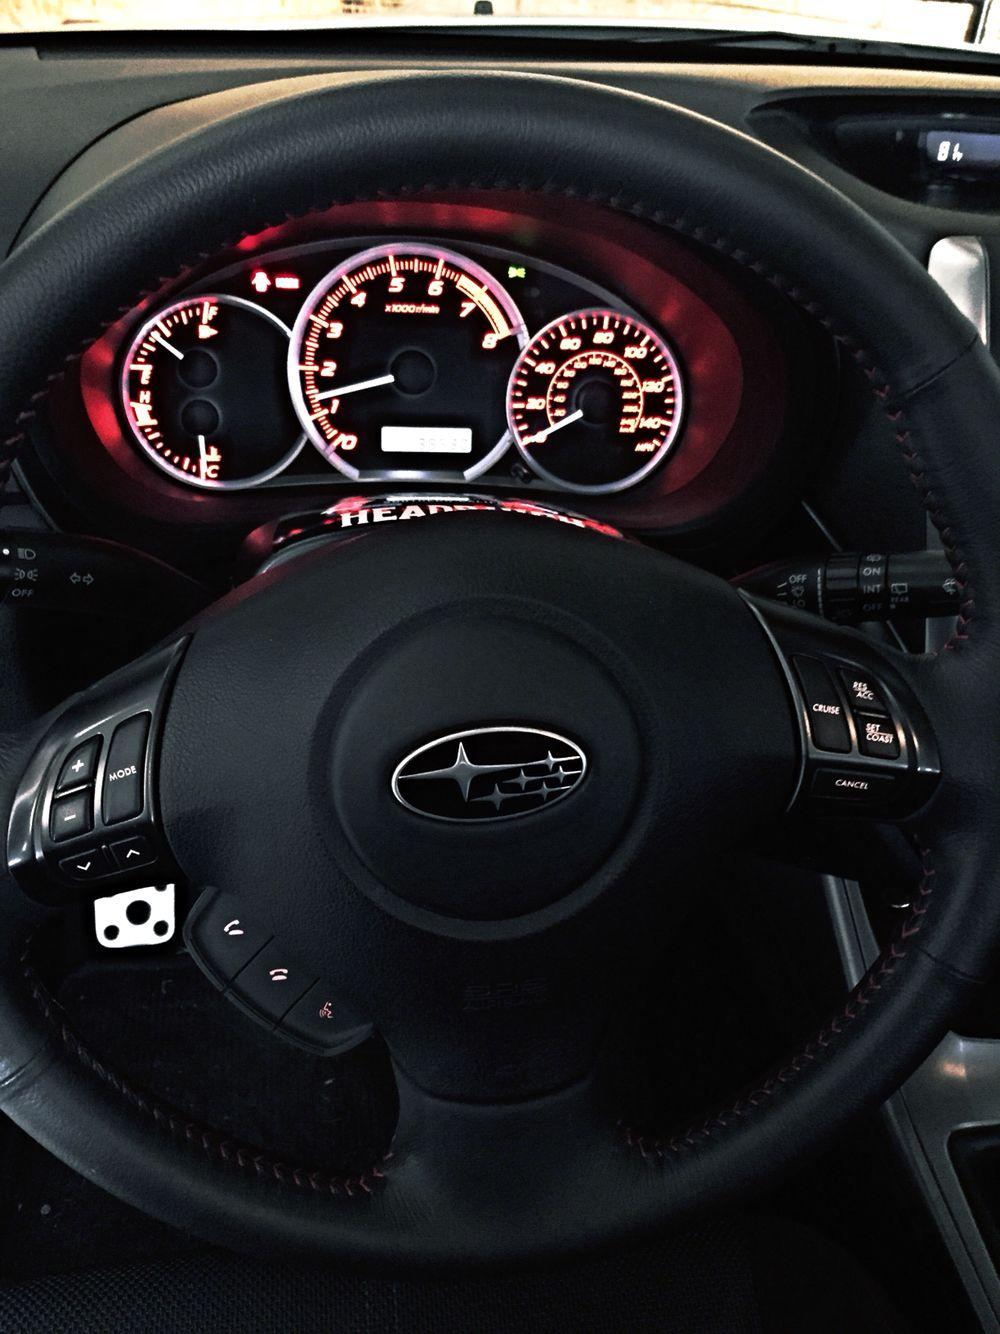 2011 Subaru Impreza Wrx Interior Subaru Pinterest Autos